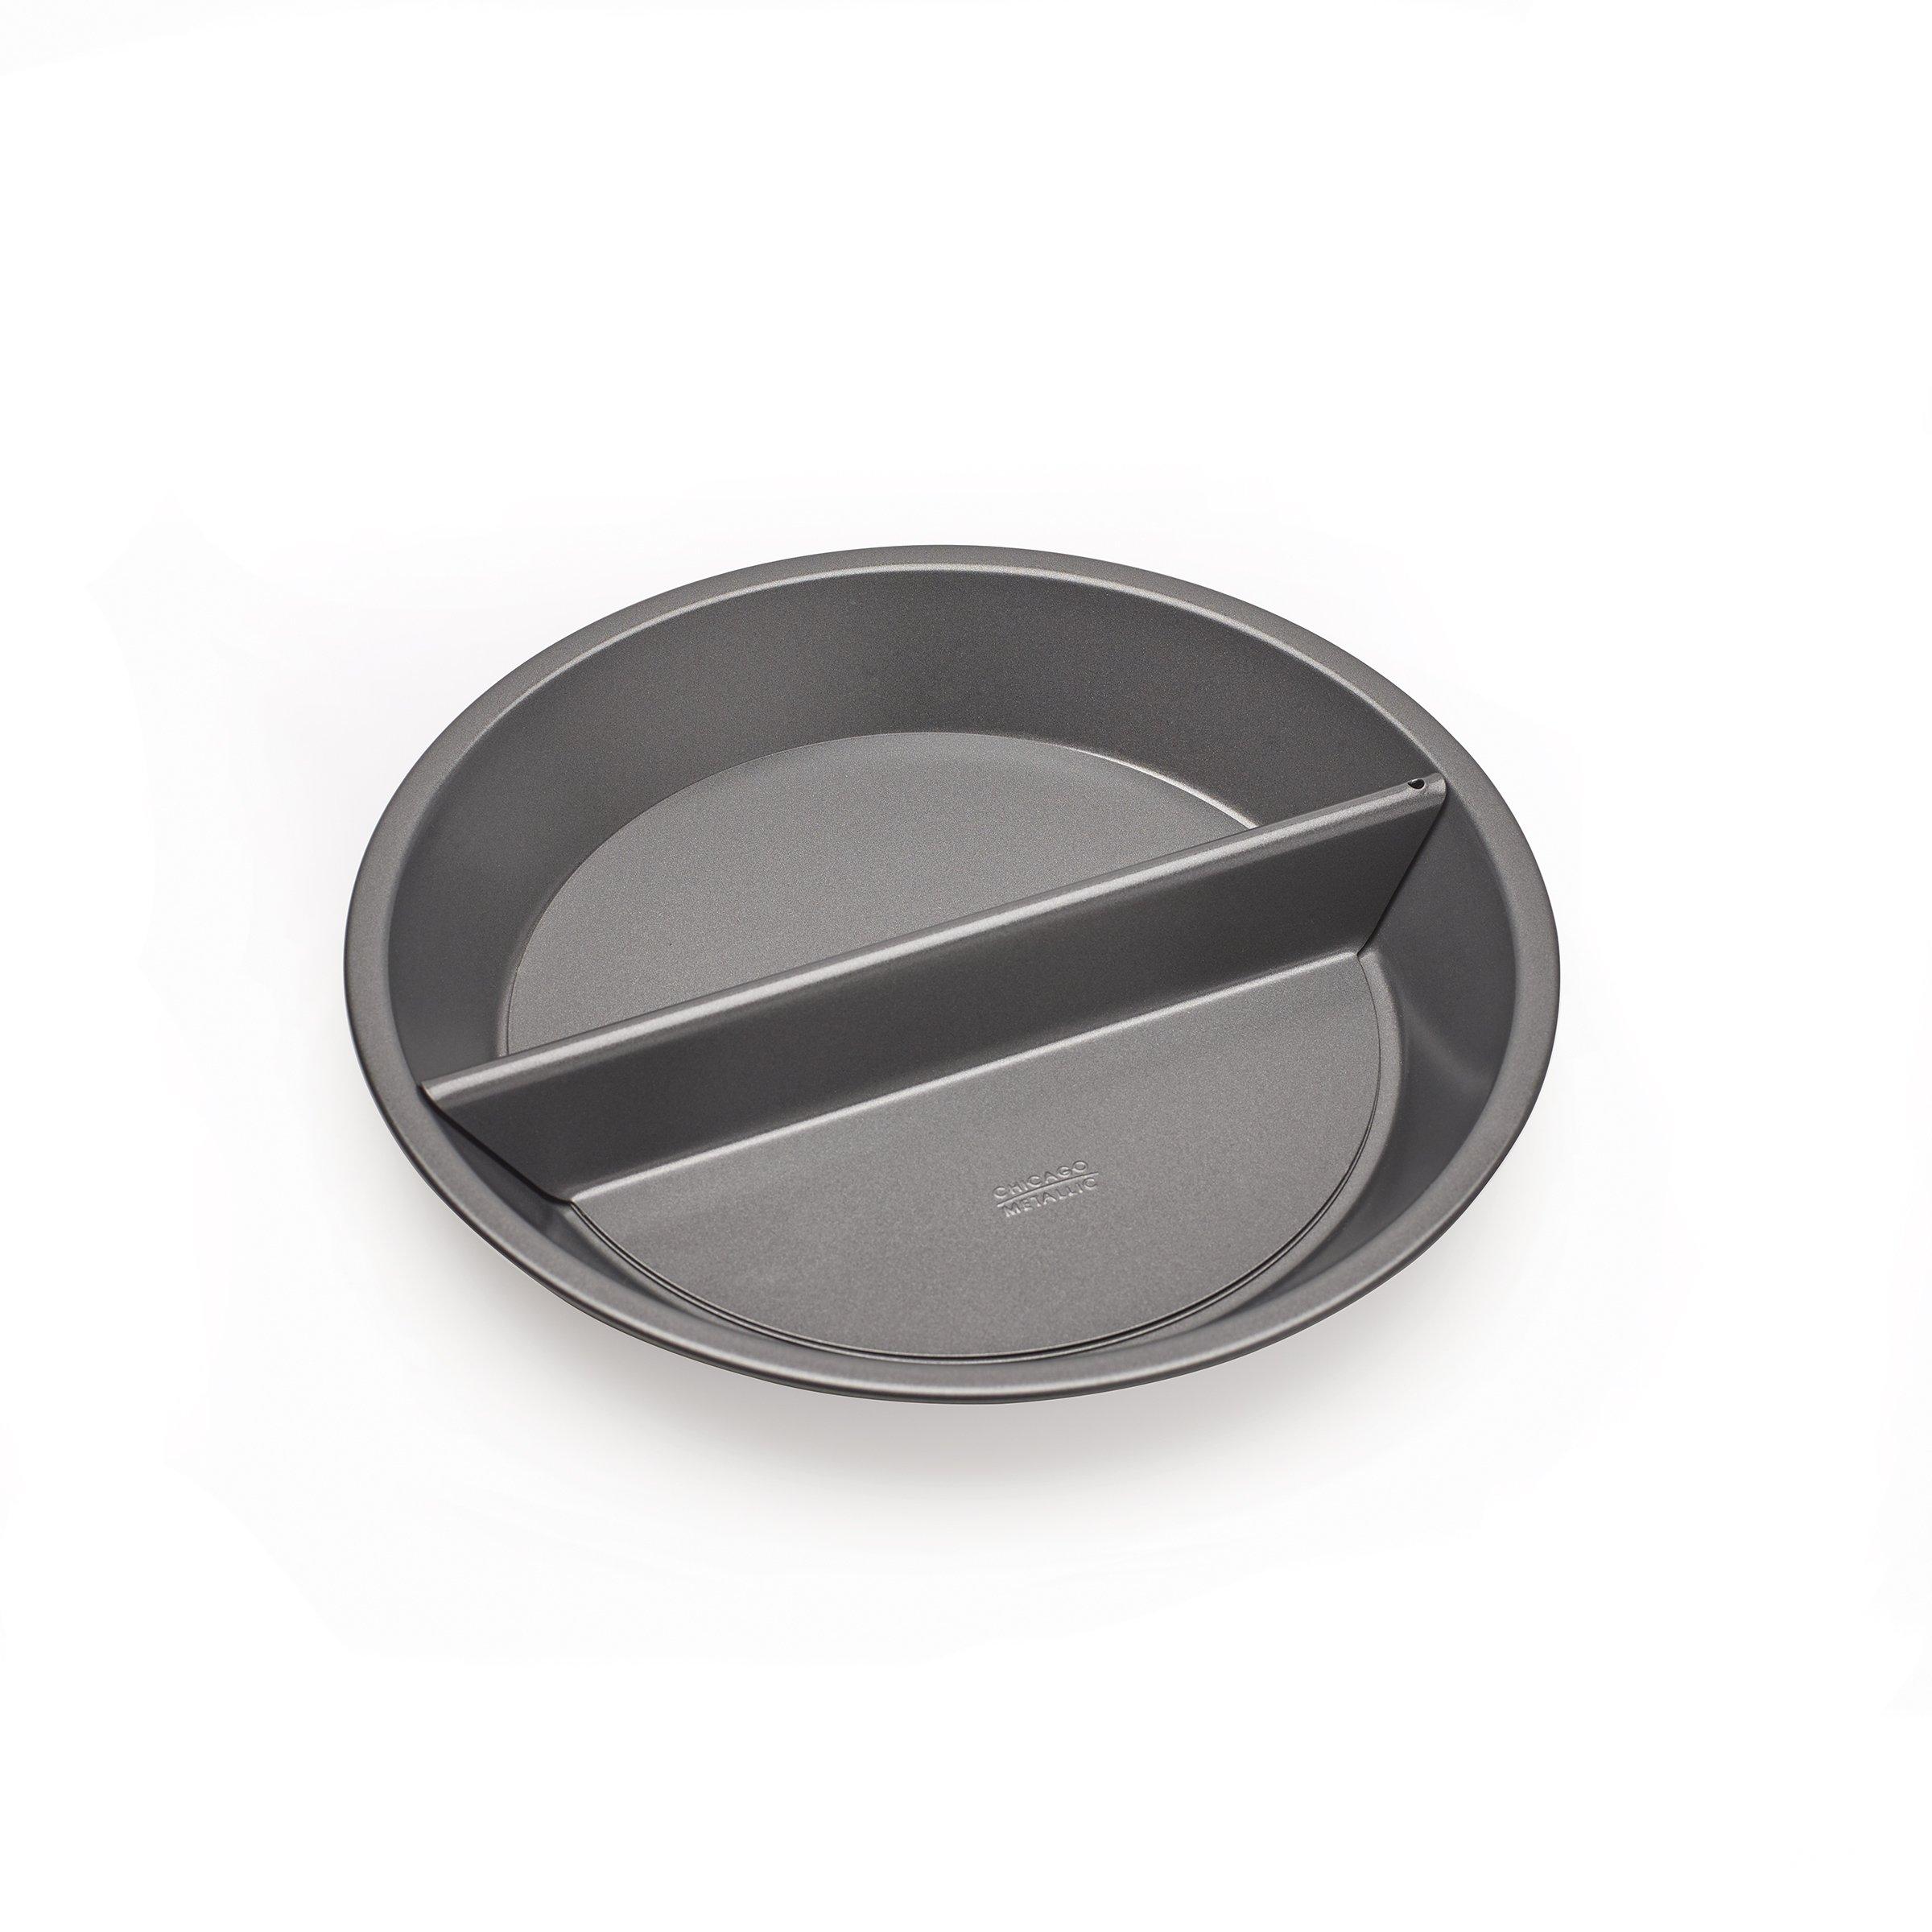 Chicago Metallic Professional Non-Stick Split Decision Pie Pan, 9-Inch by Chicago Metallic